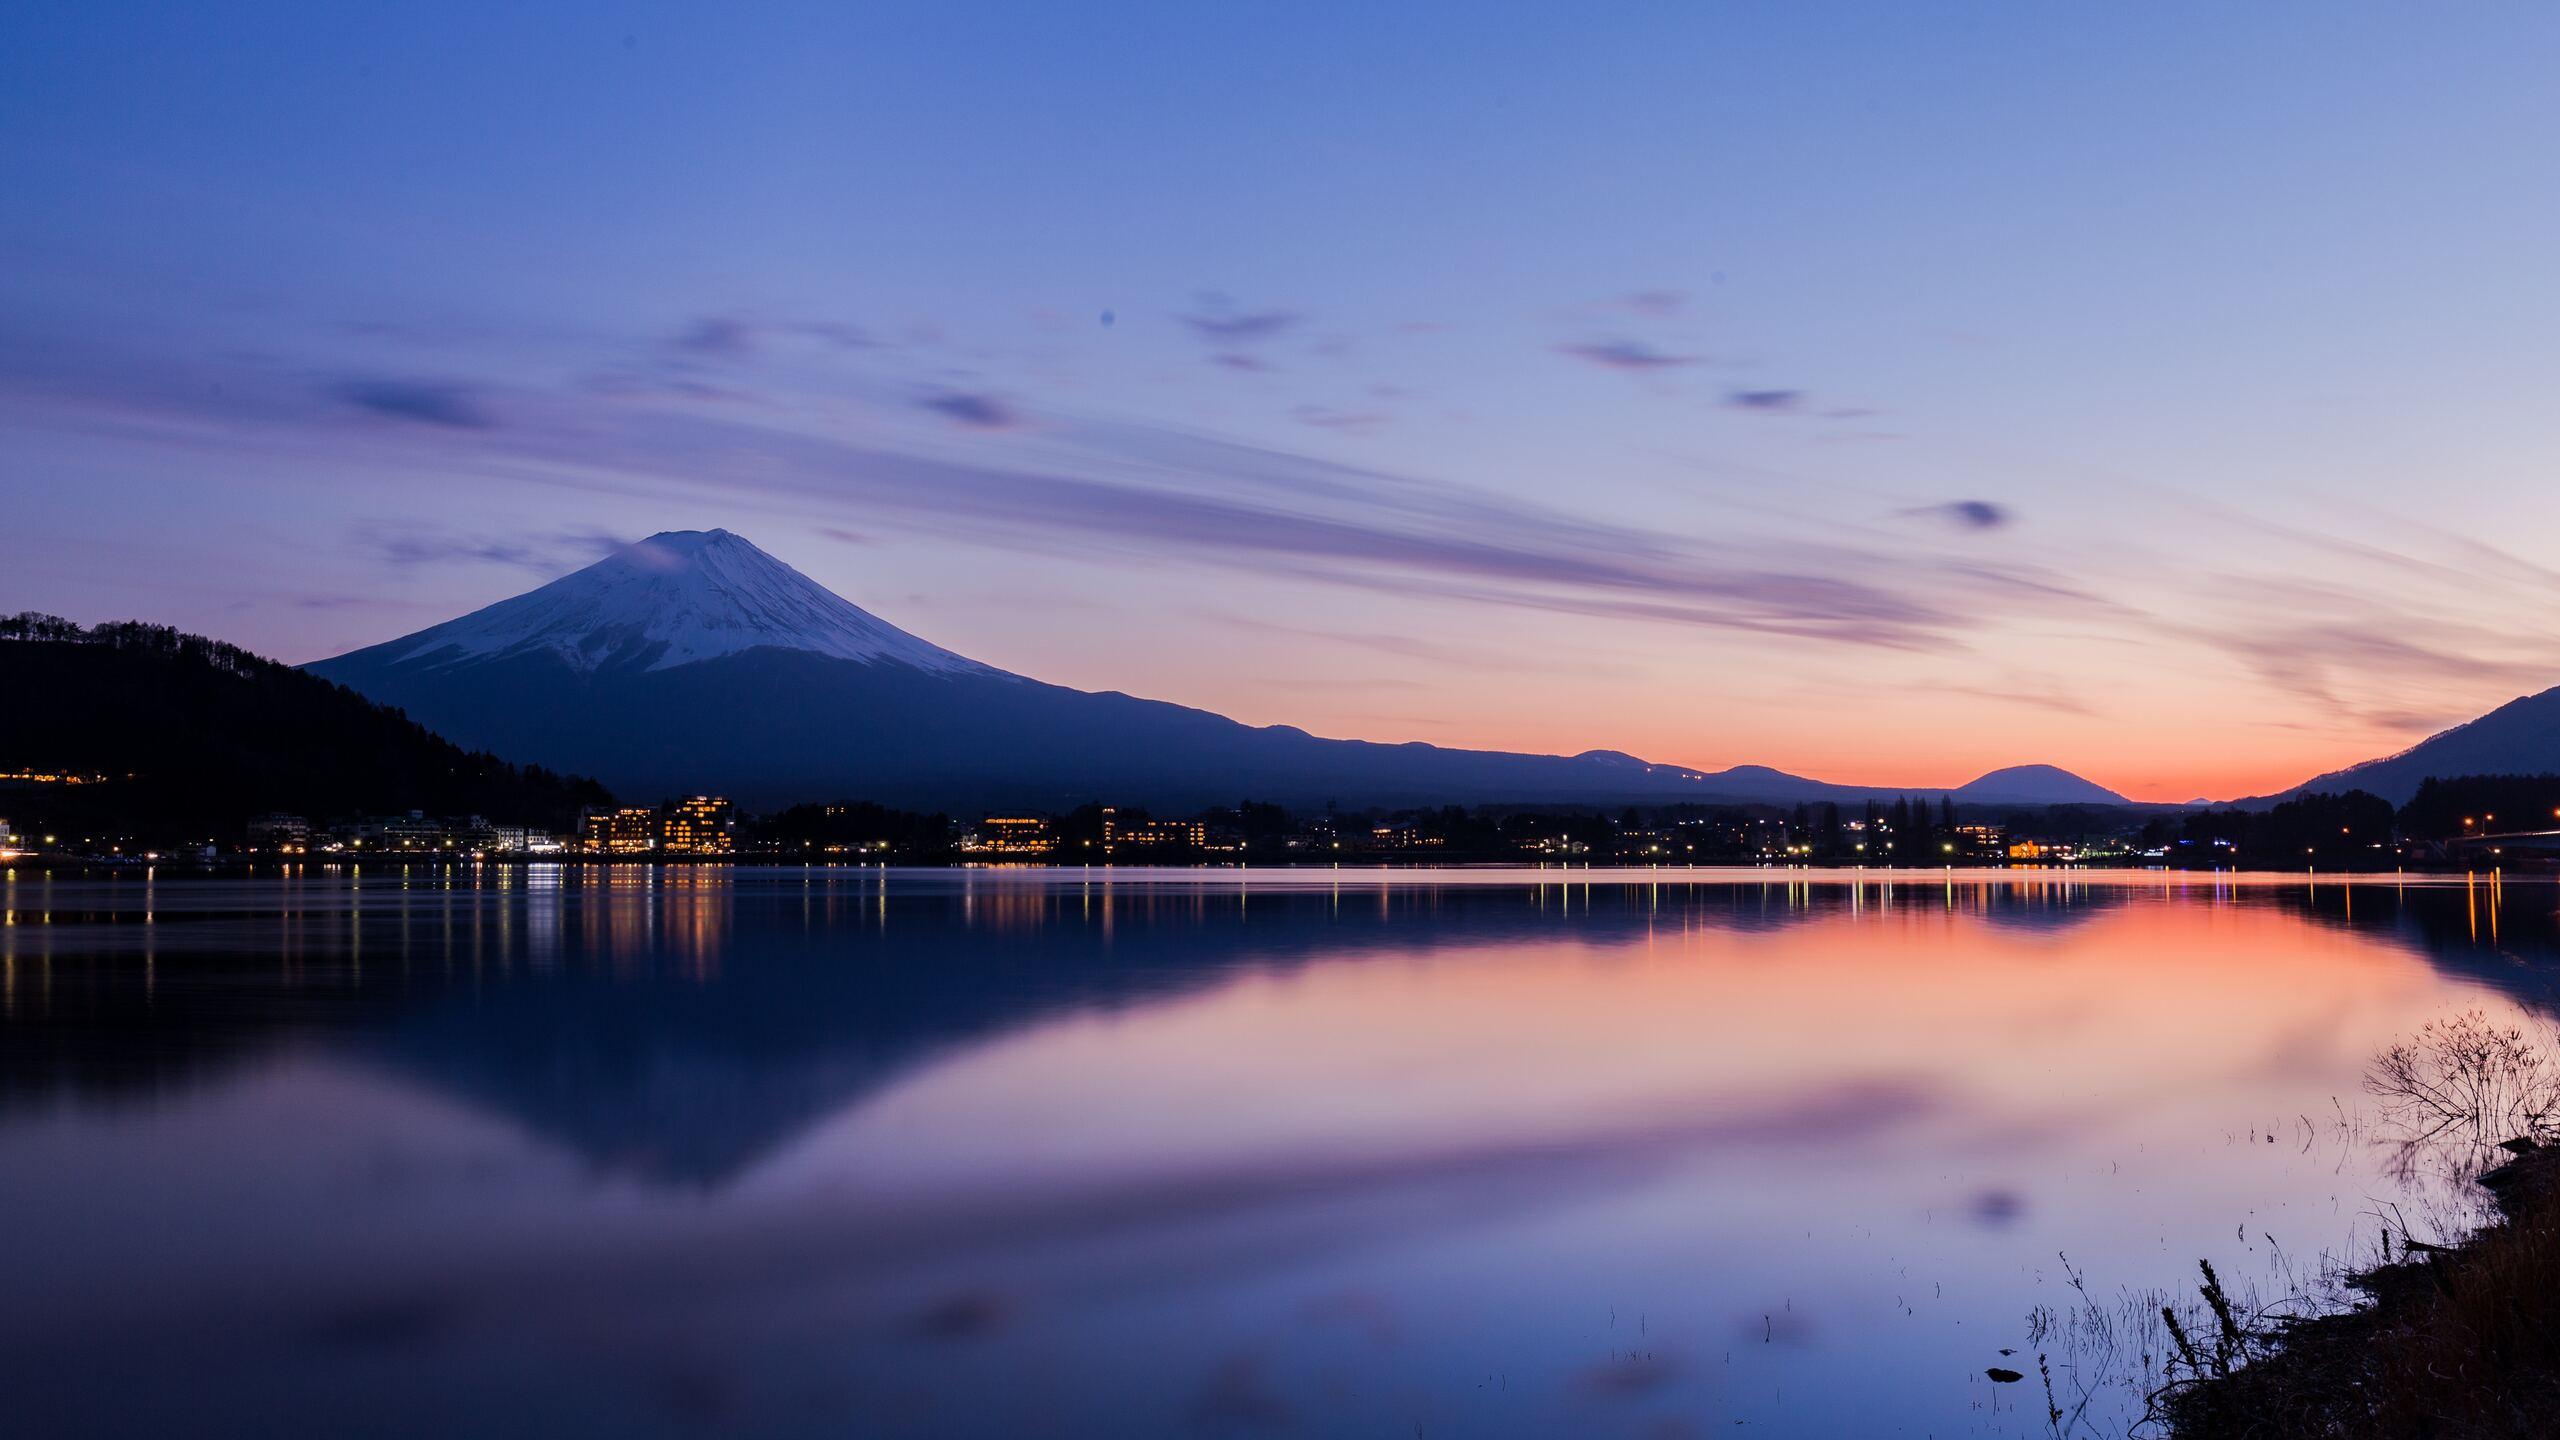 lake-kawaguchi-in-japan-fc.jpg